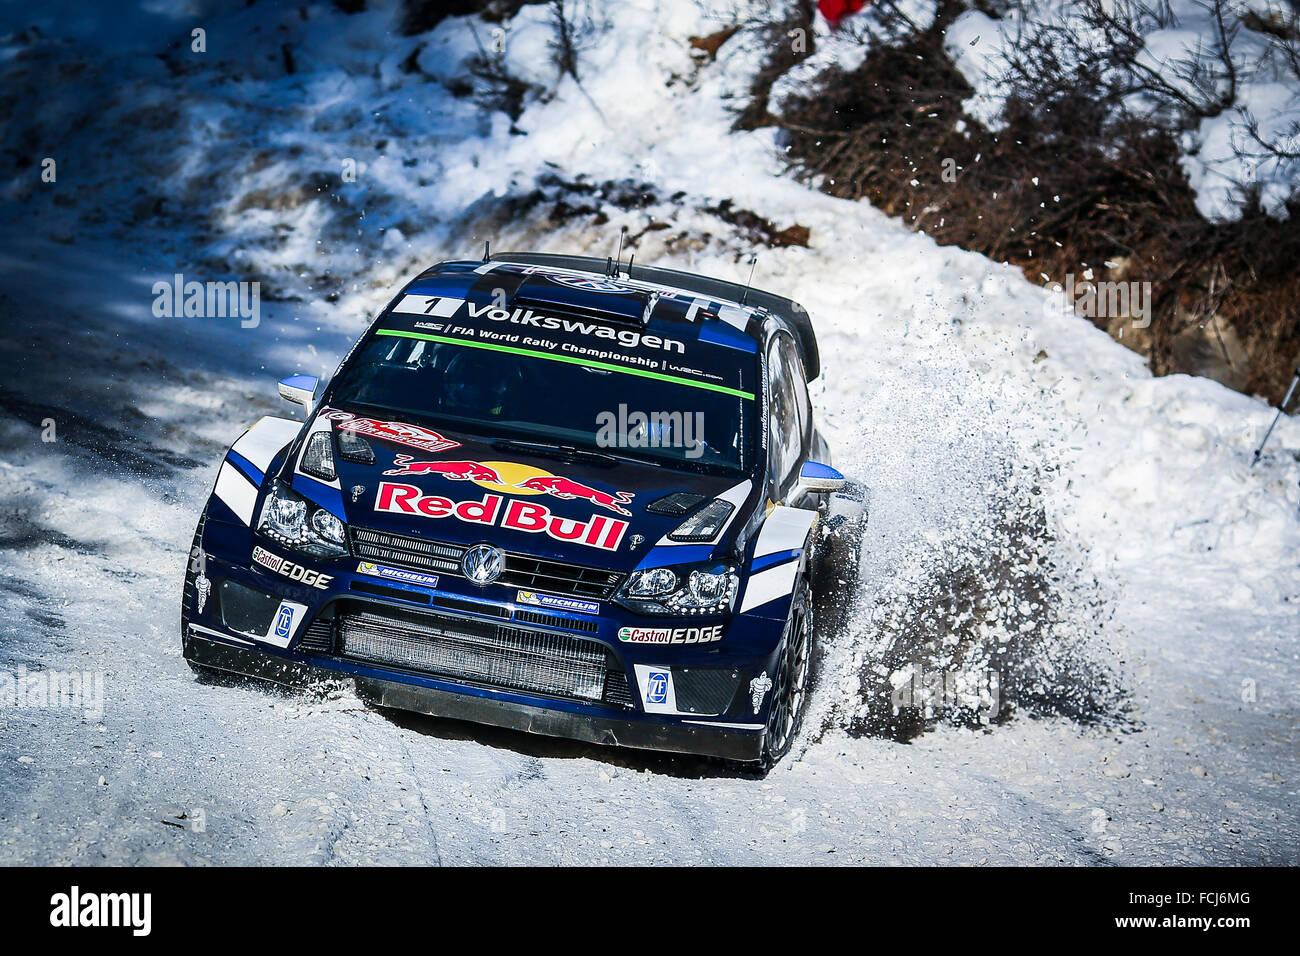 Monte Carlo, Monaco. 21 Jan, 2016. Le Rallye de Monte Carlo 2016. Les voitures de la course. Sebastien Ogier (FR) Photo Stock